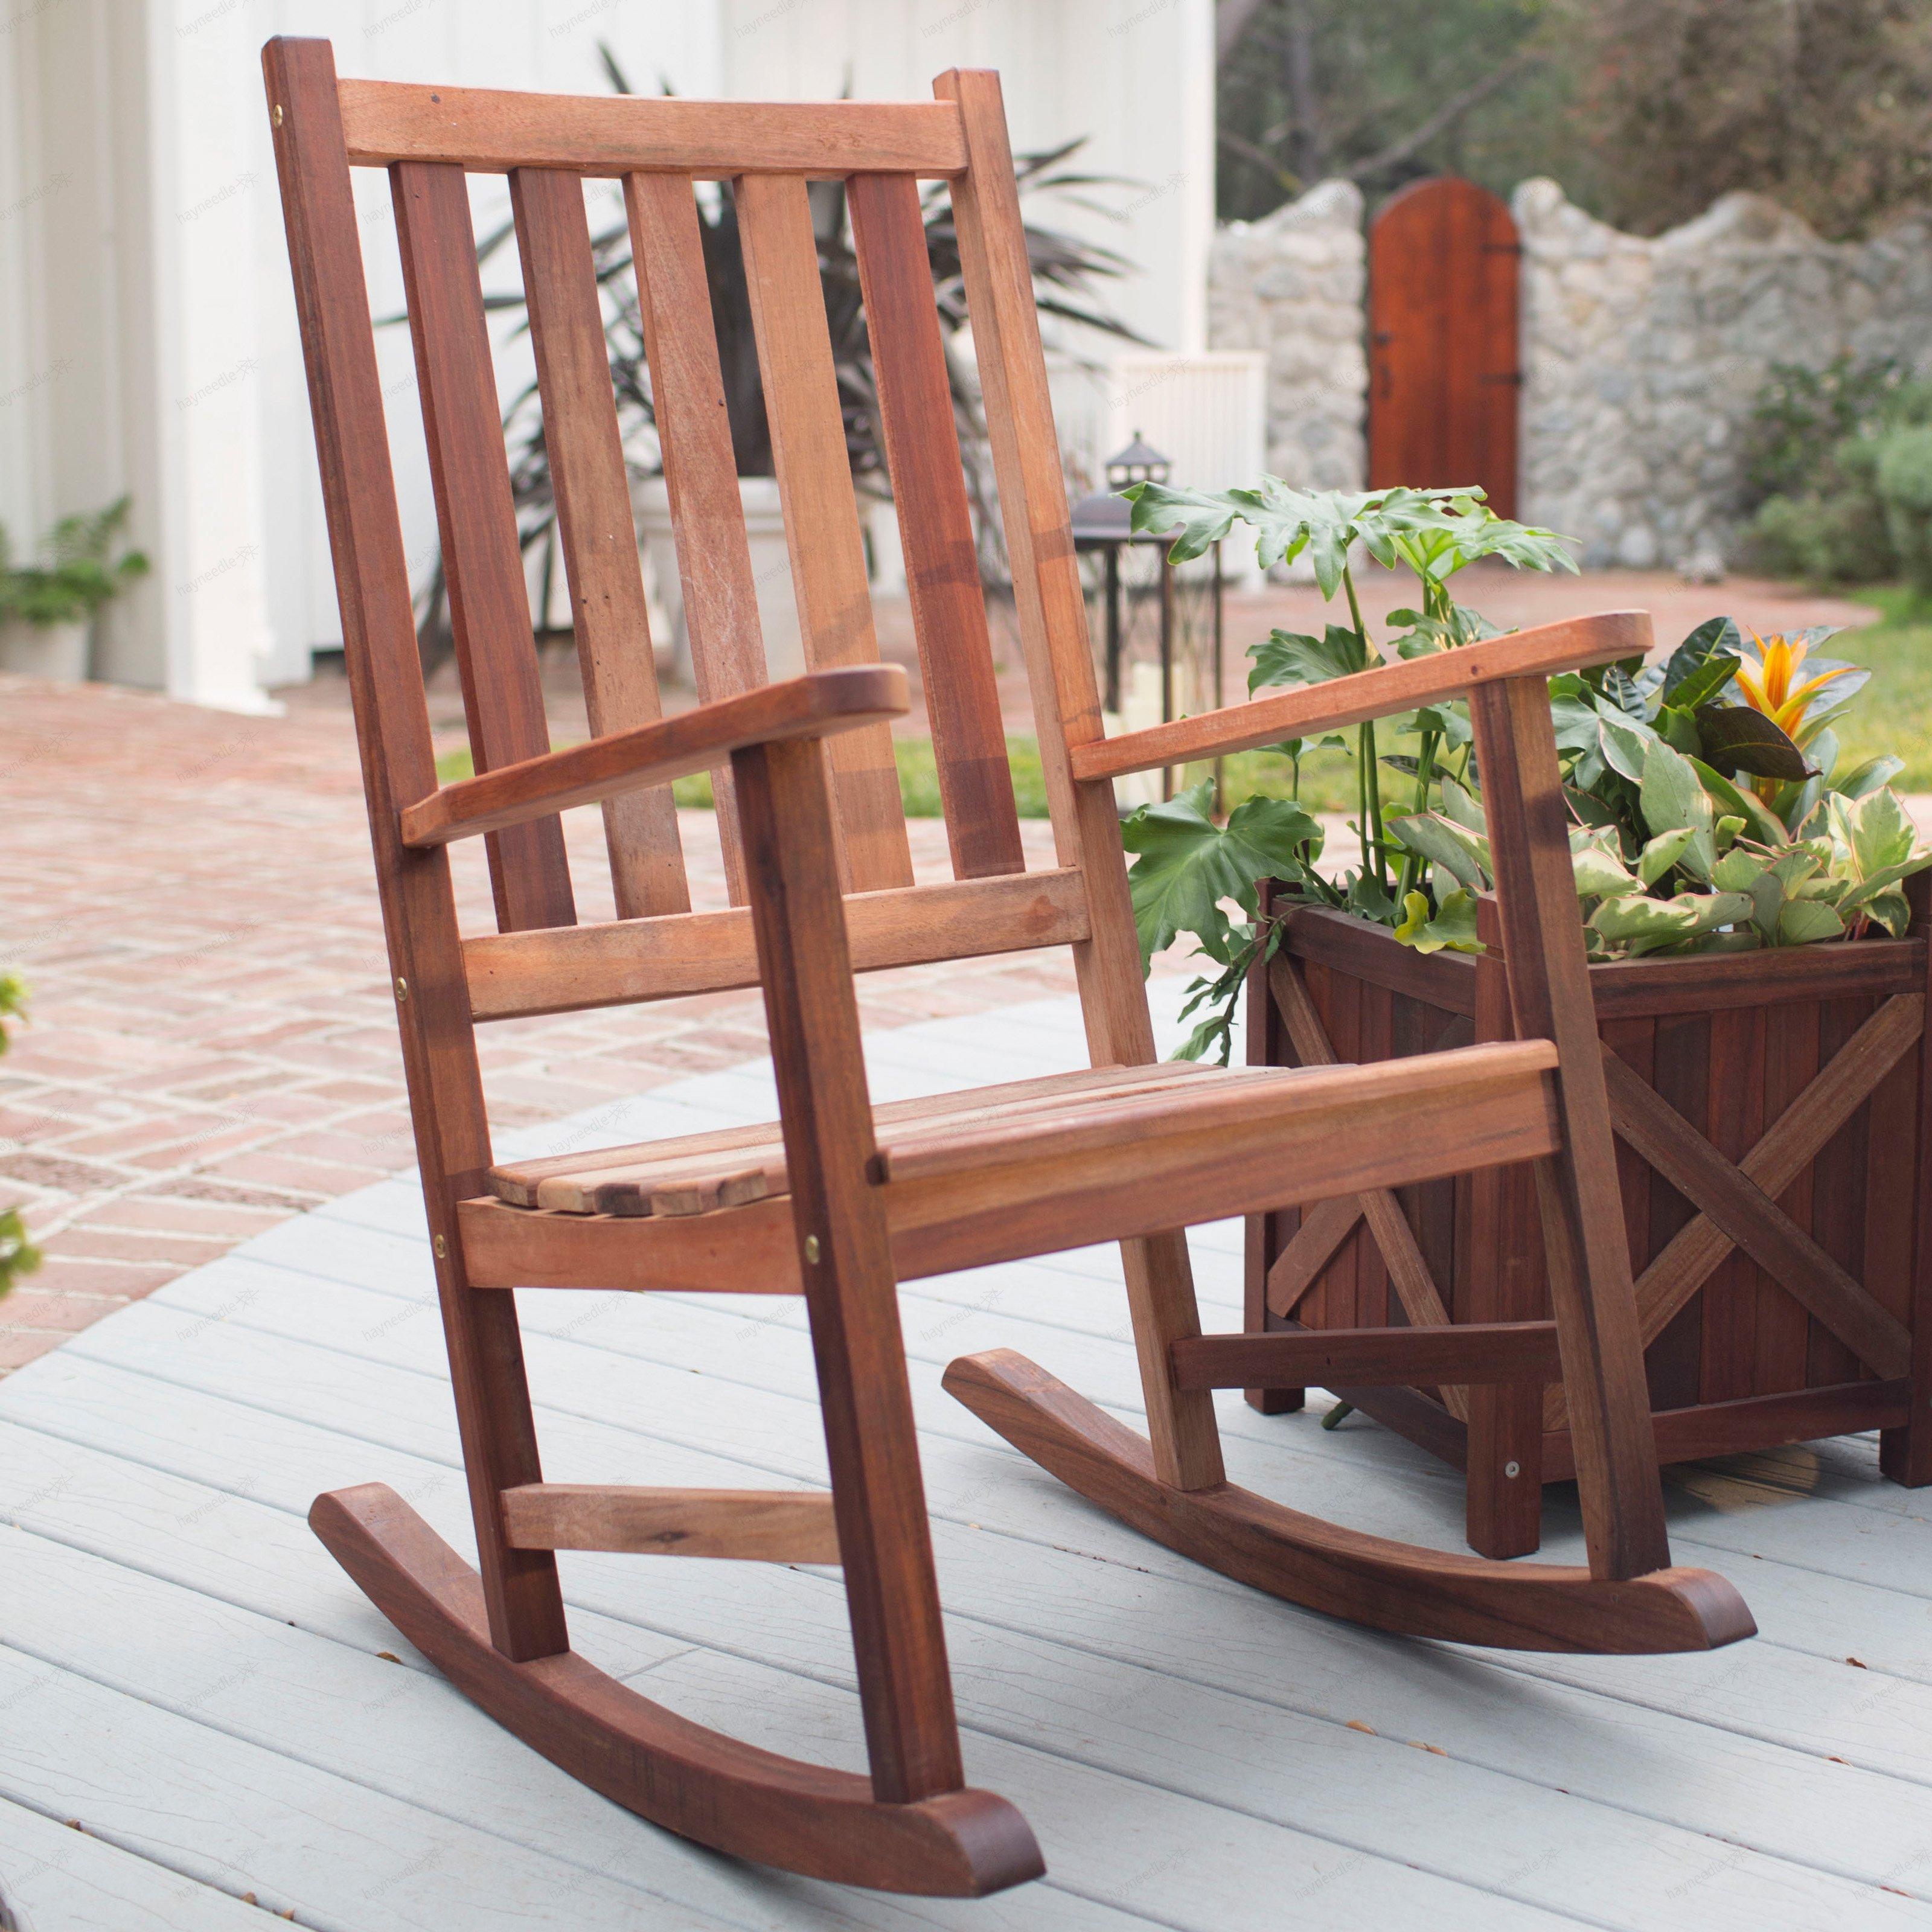 Elegant Belham Living Richmond Heavy-Duty Outdoor Wooden Rocking Chair - Walmart.com outdoor wooden rocking chairs